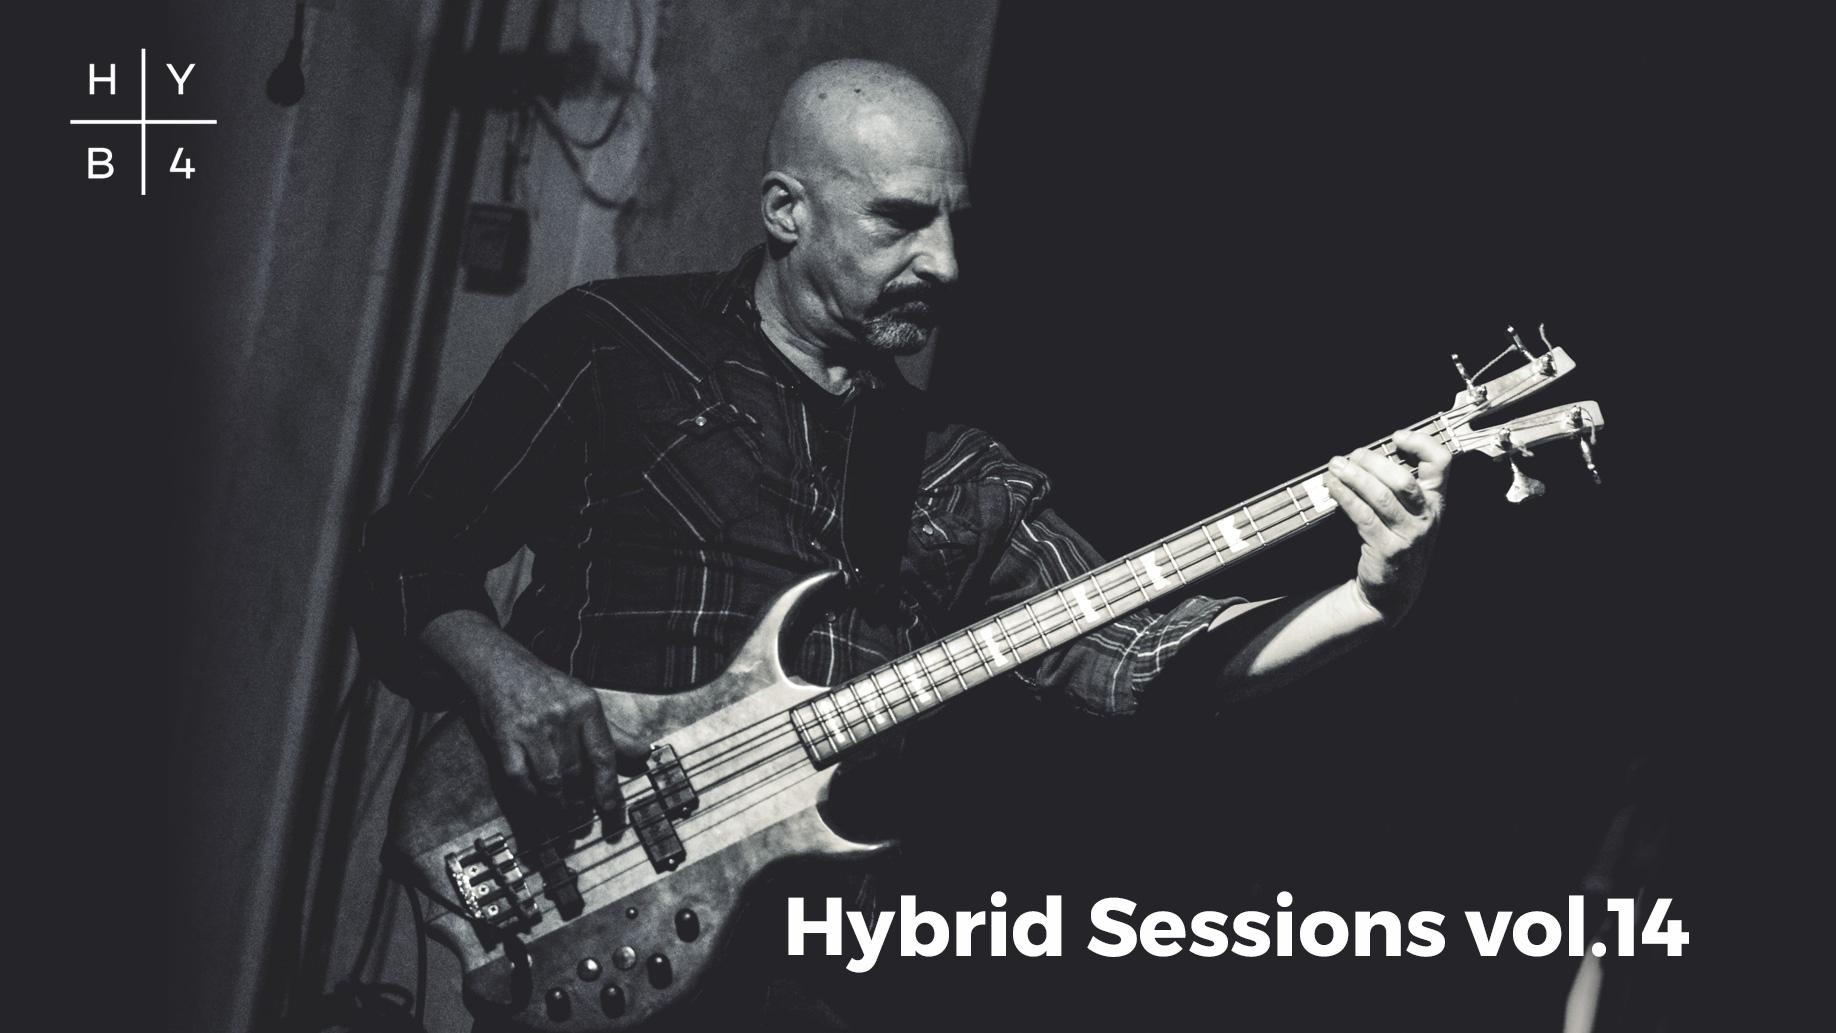 HYB4 HUDBA: Hybrid sessions vol.14